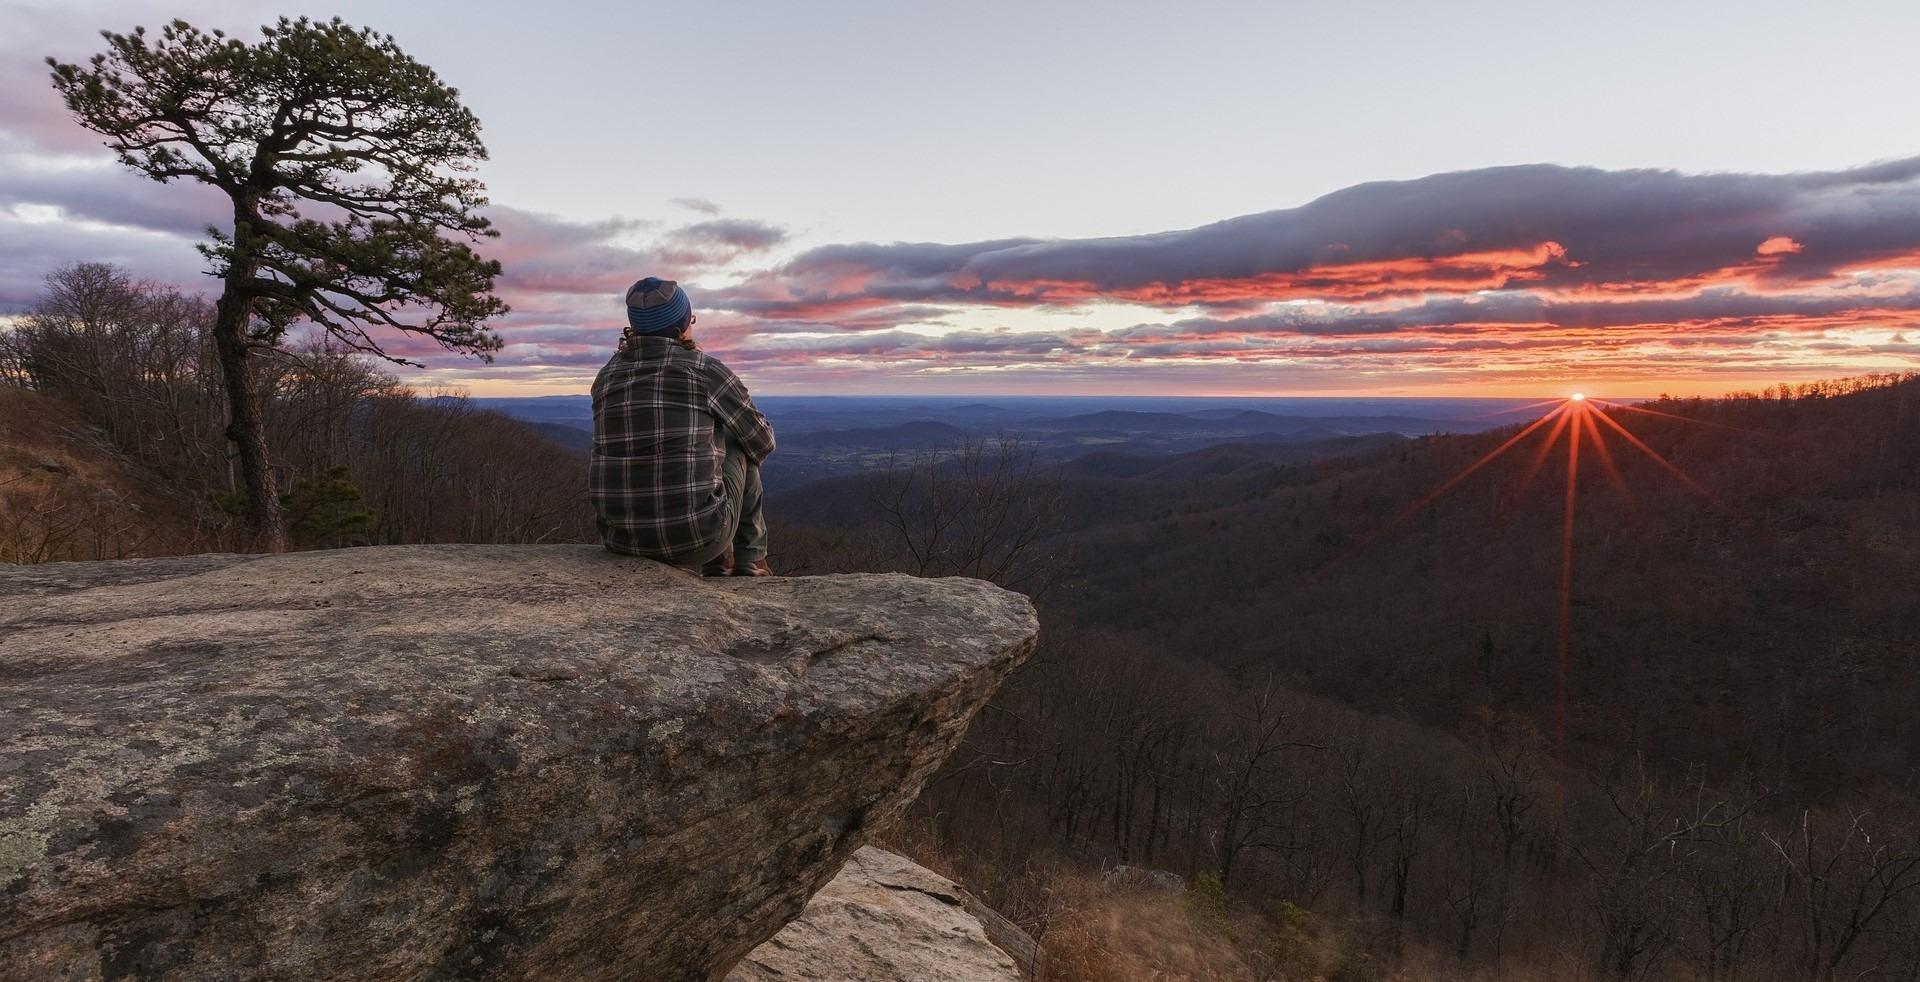 Overwhelming Sunrise in Annandale, Virginia - GoodwillCarDonation.org